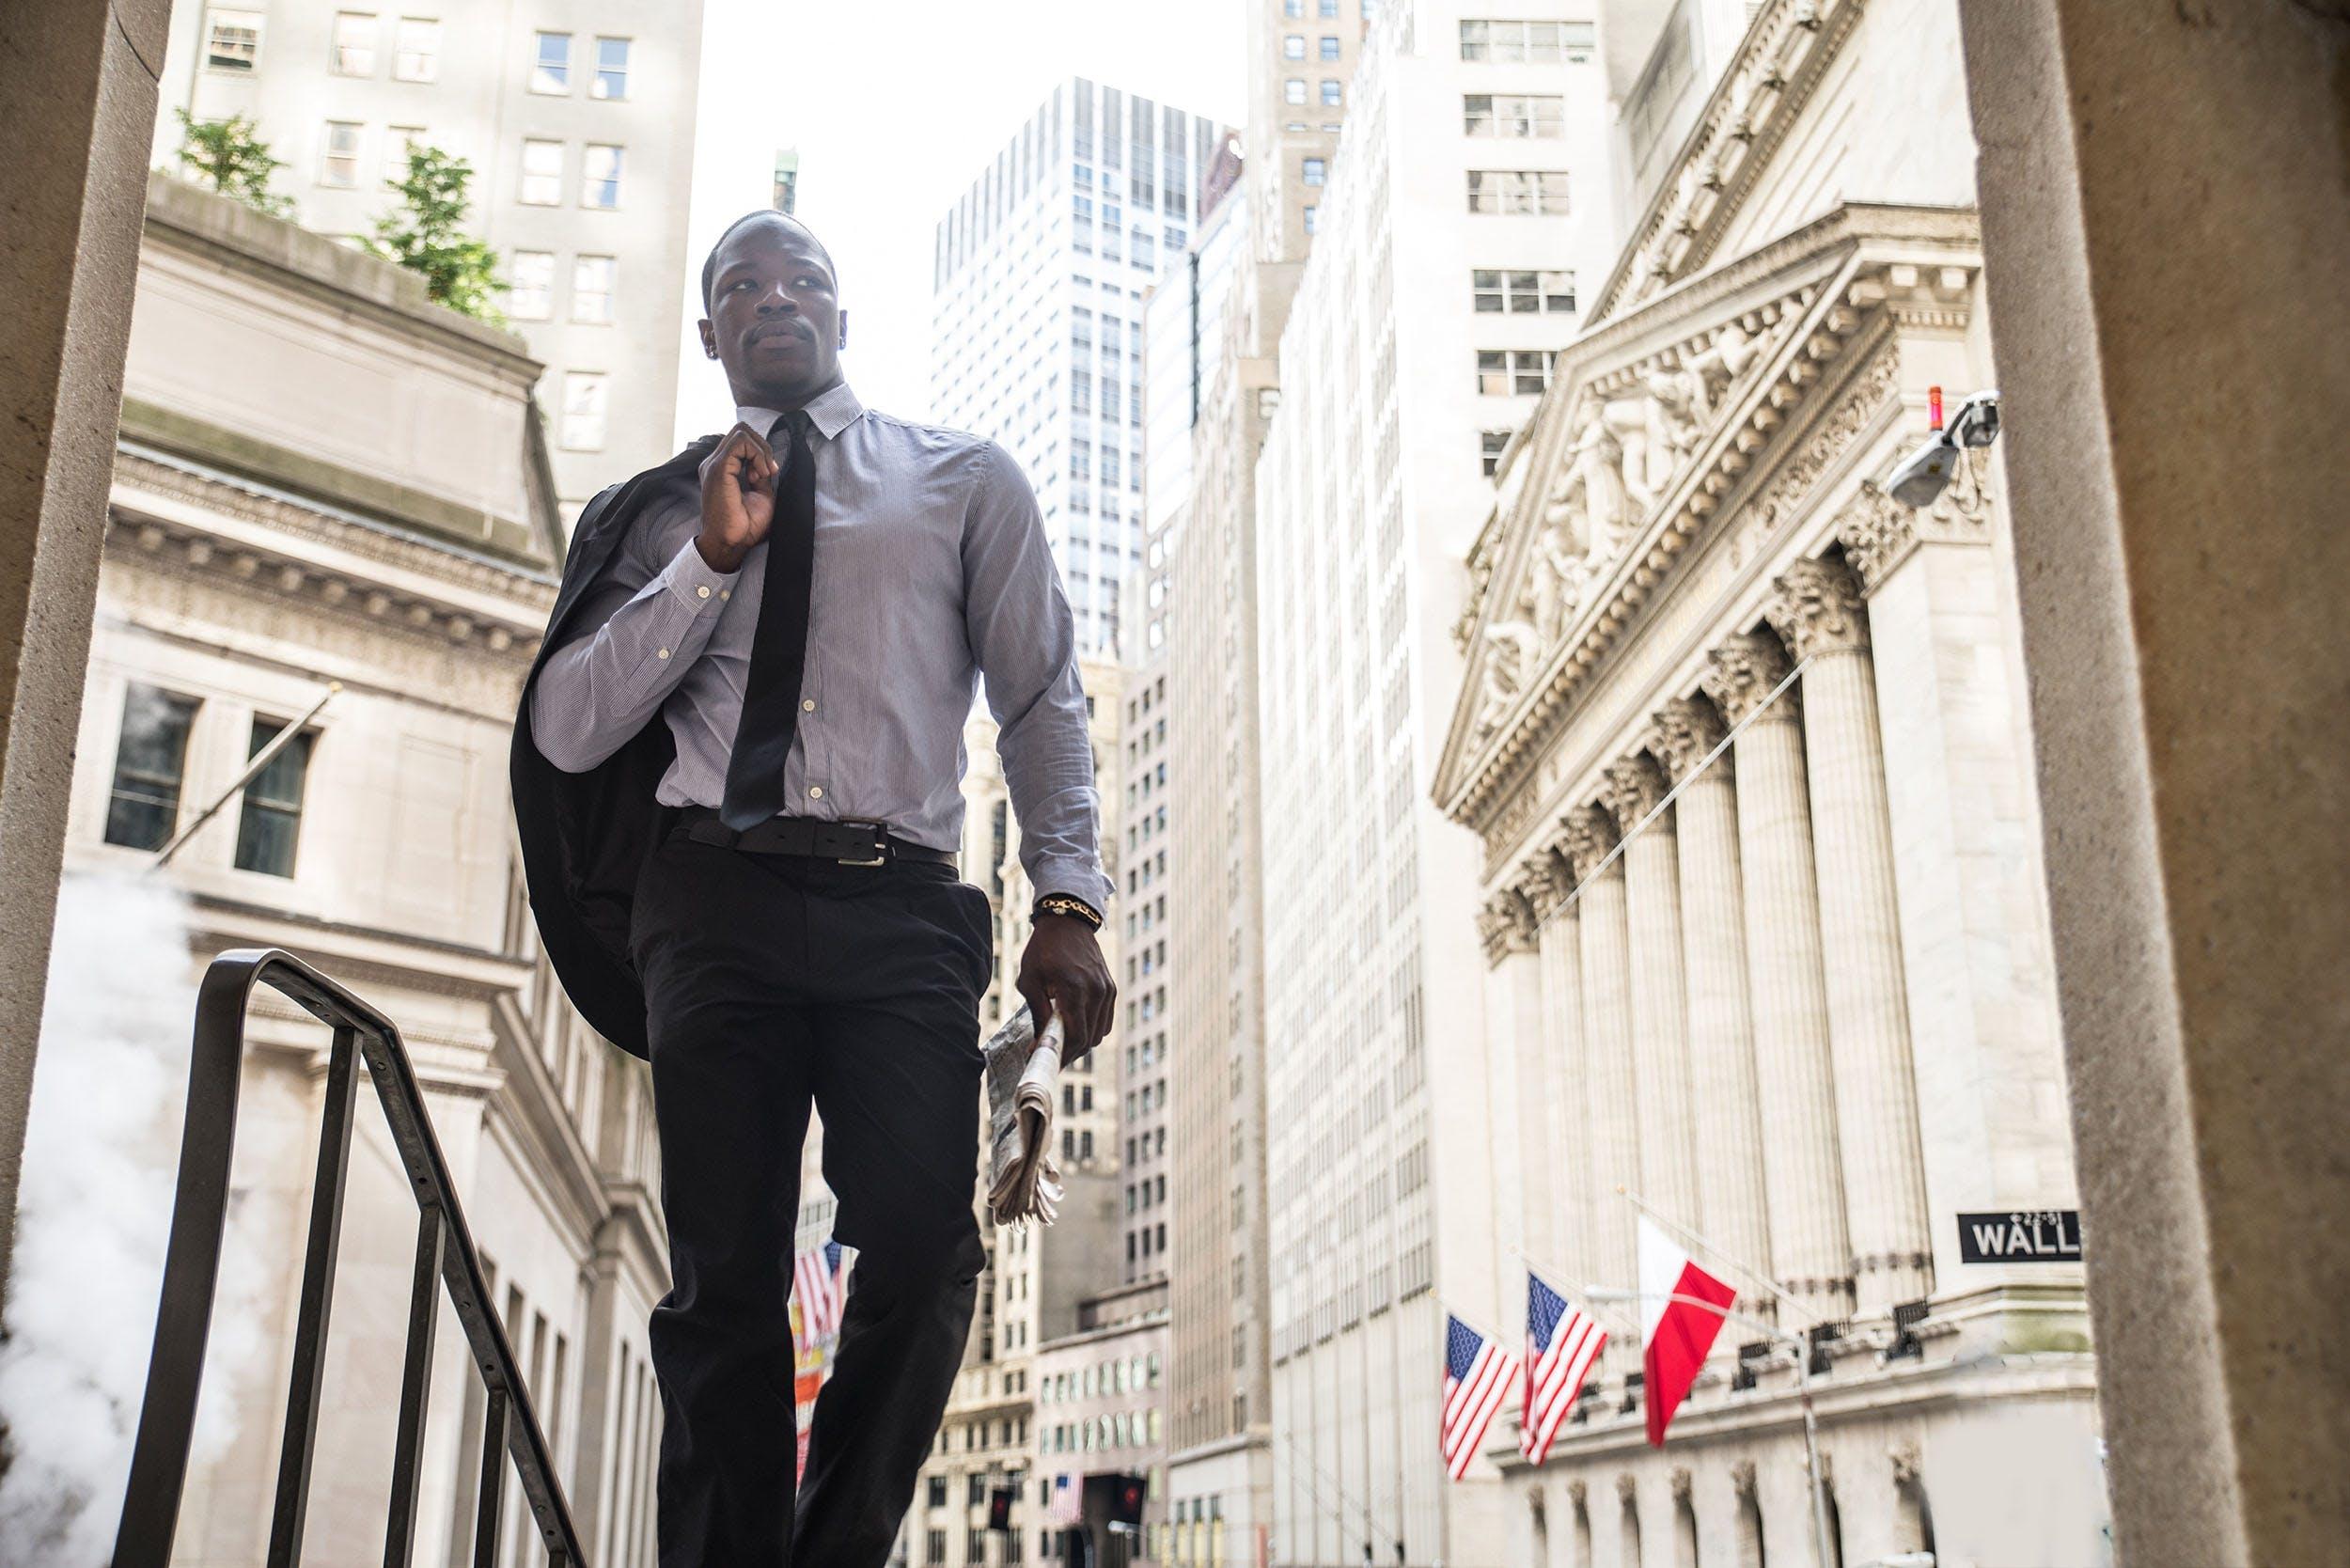 Businessman on Wall Street - Lower Manhattan - New York City